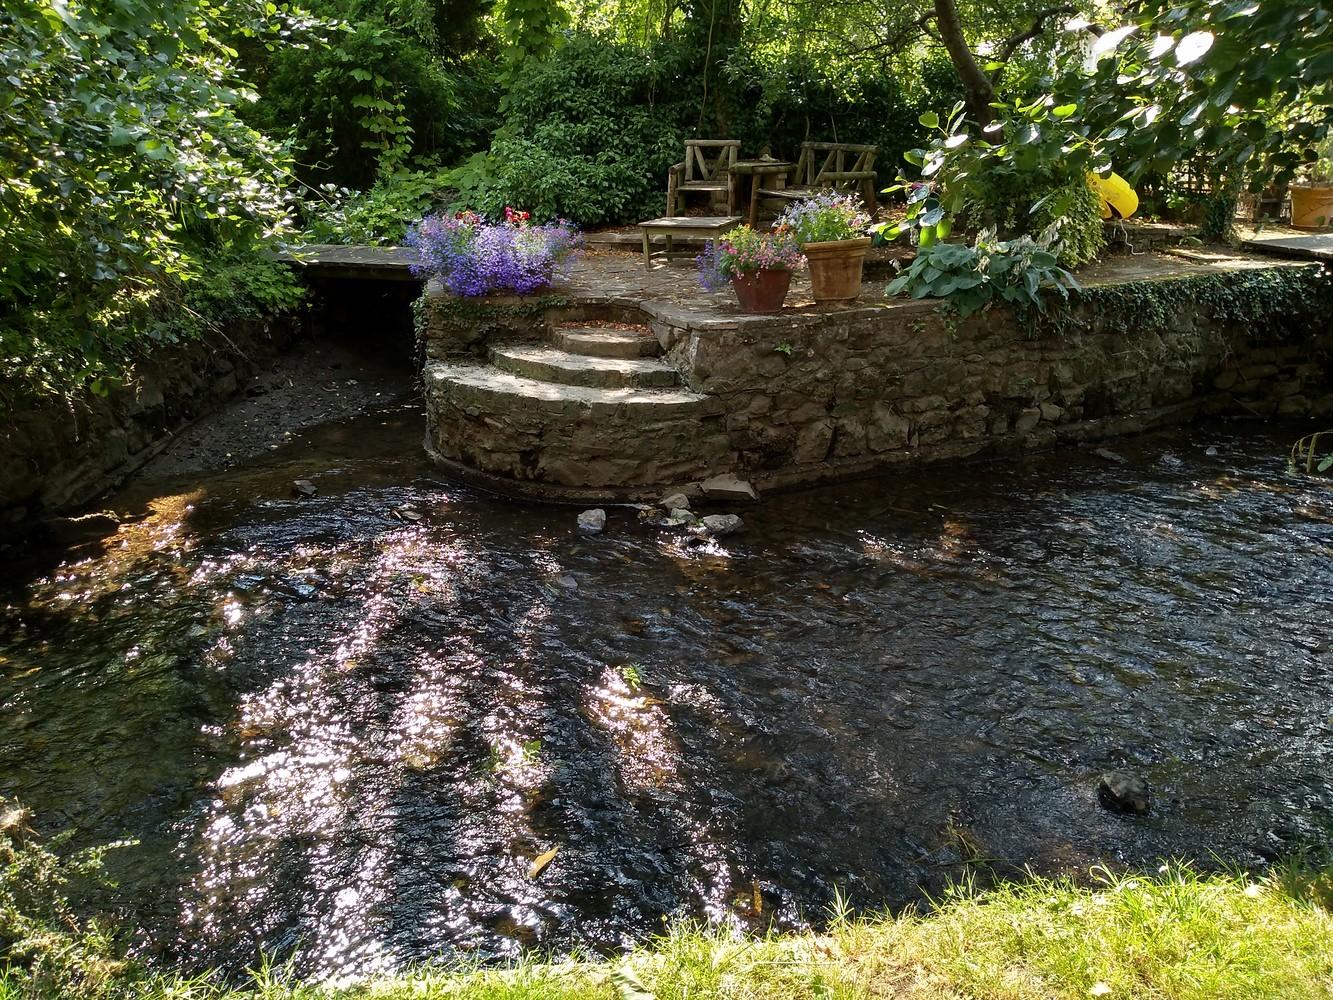 River Darent and Garden